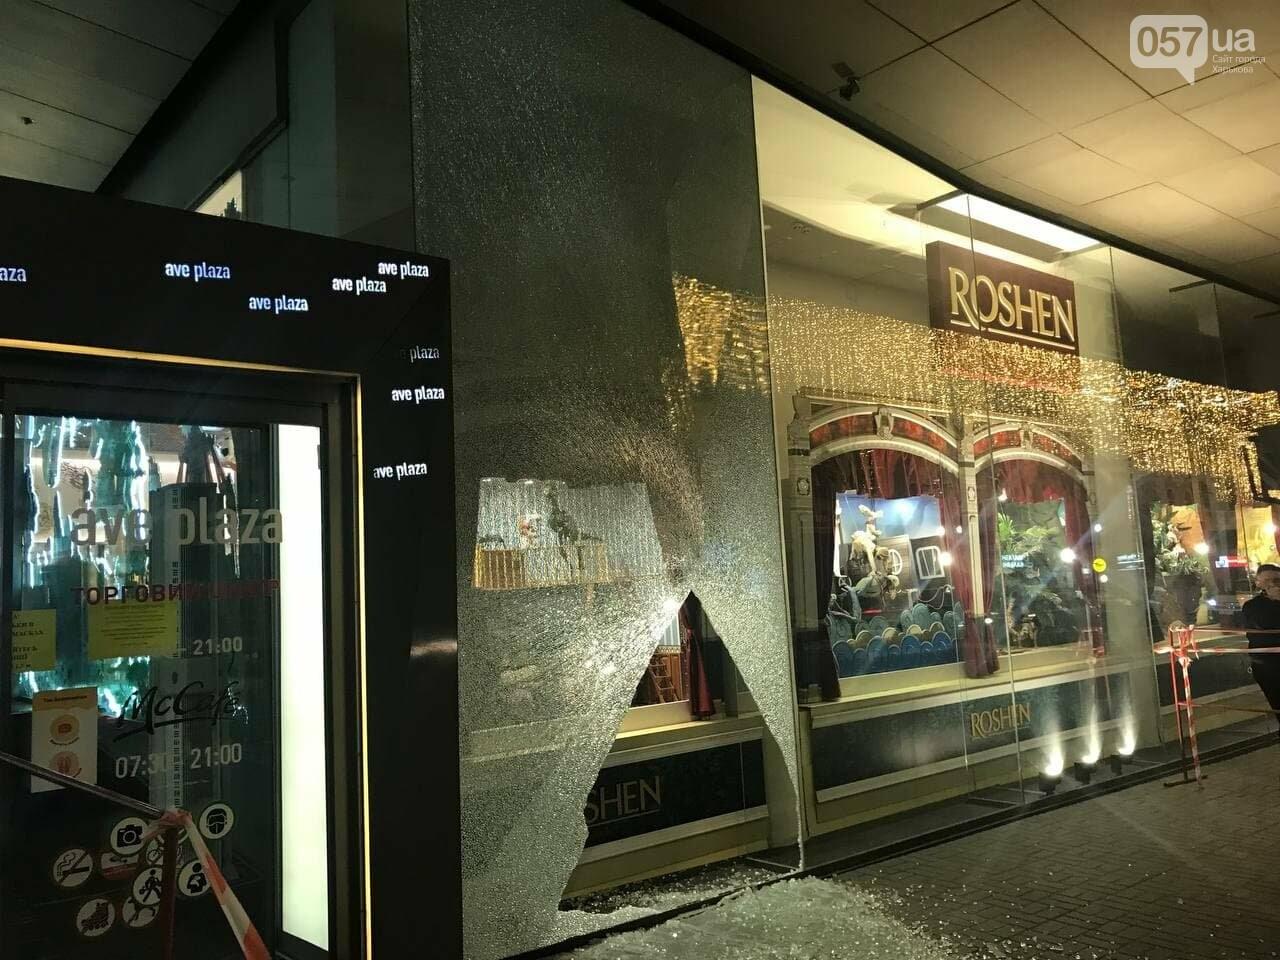 В центре Харькова неизвестные разгромили витрину ТЦ, - ФОТО, фото-4